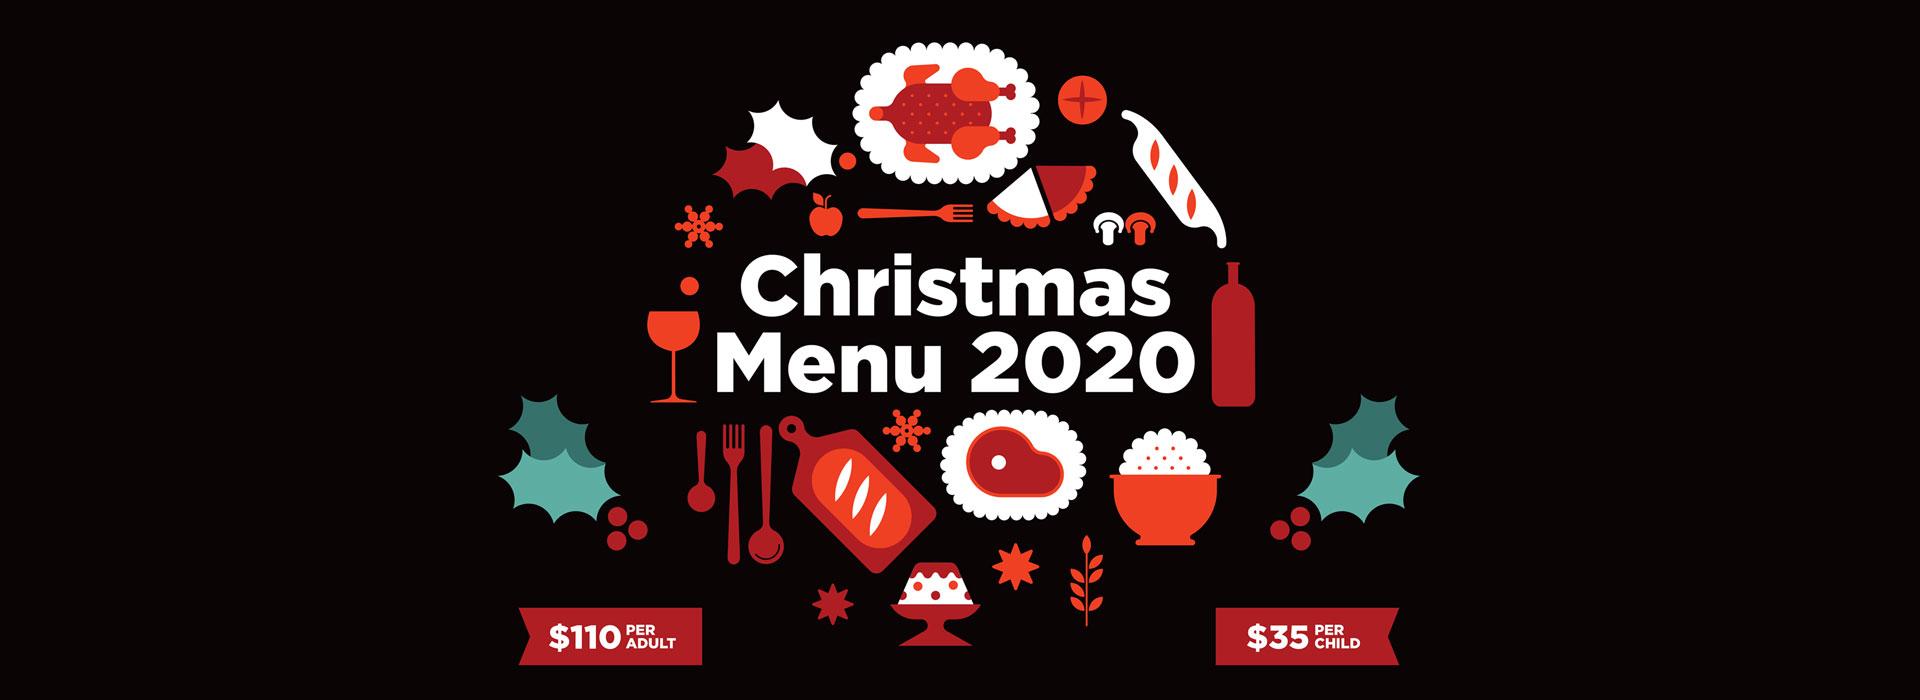 glenferrie hotel christmas menu